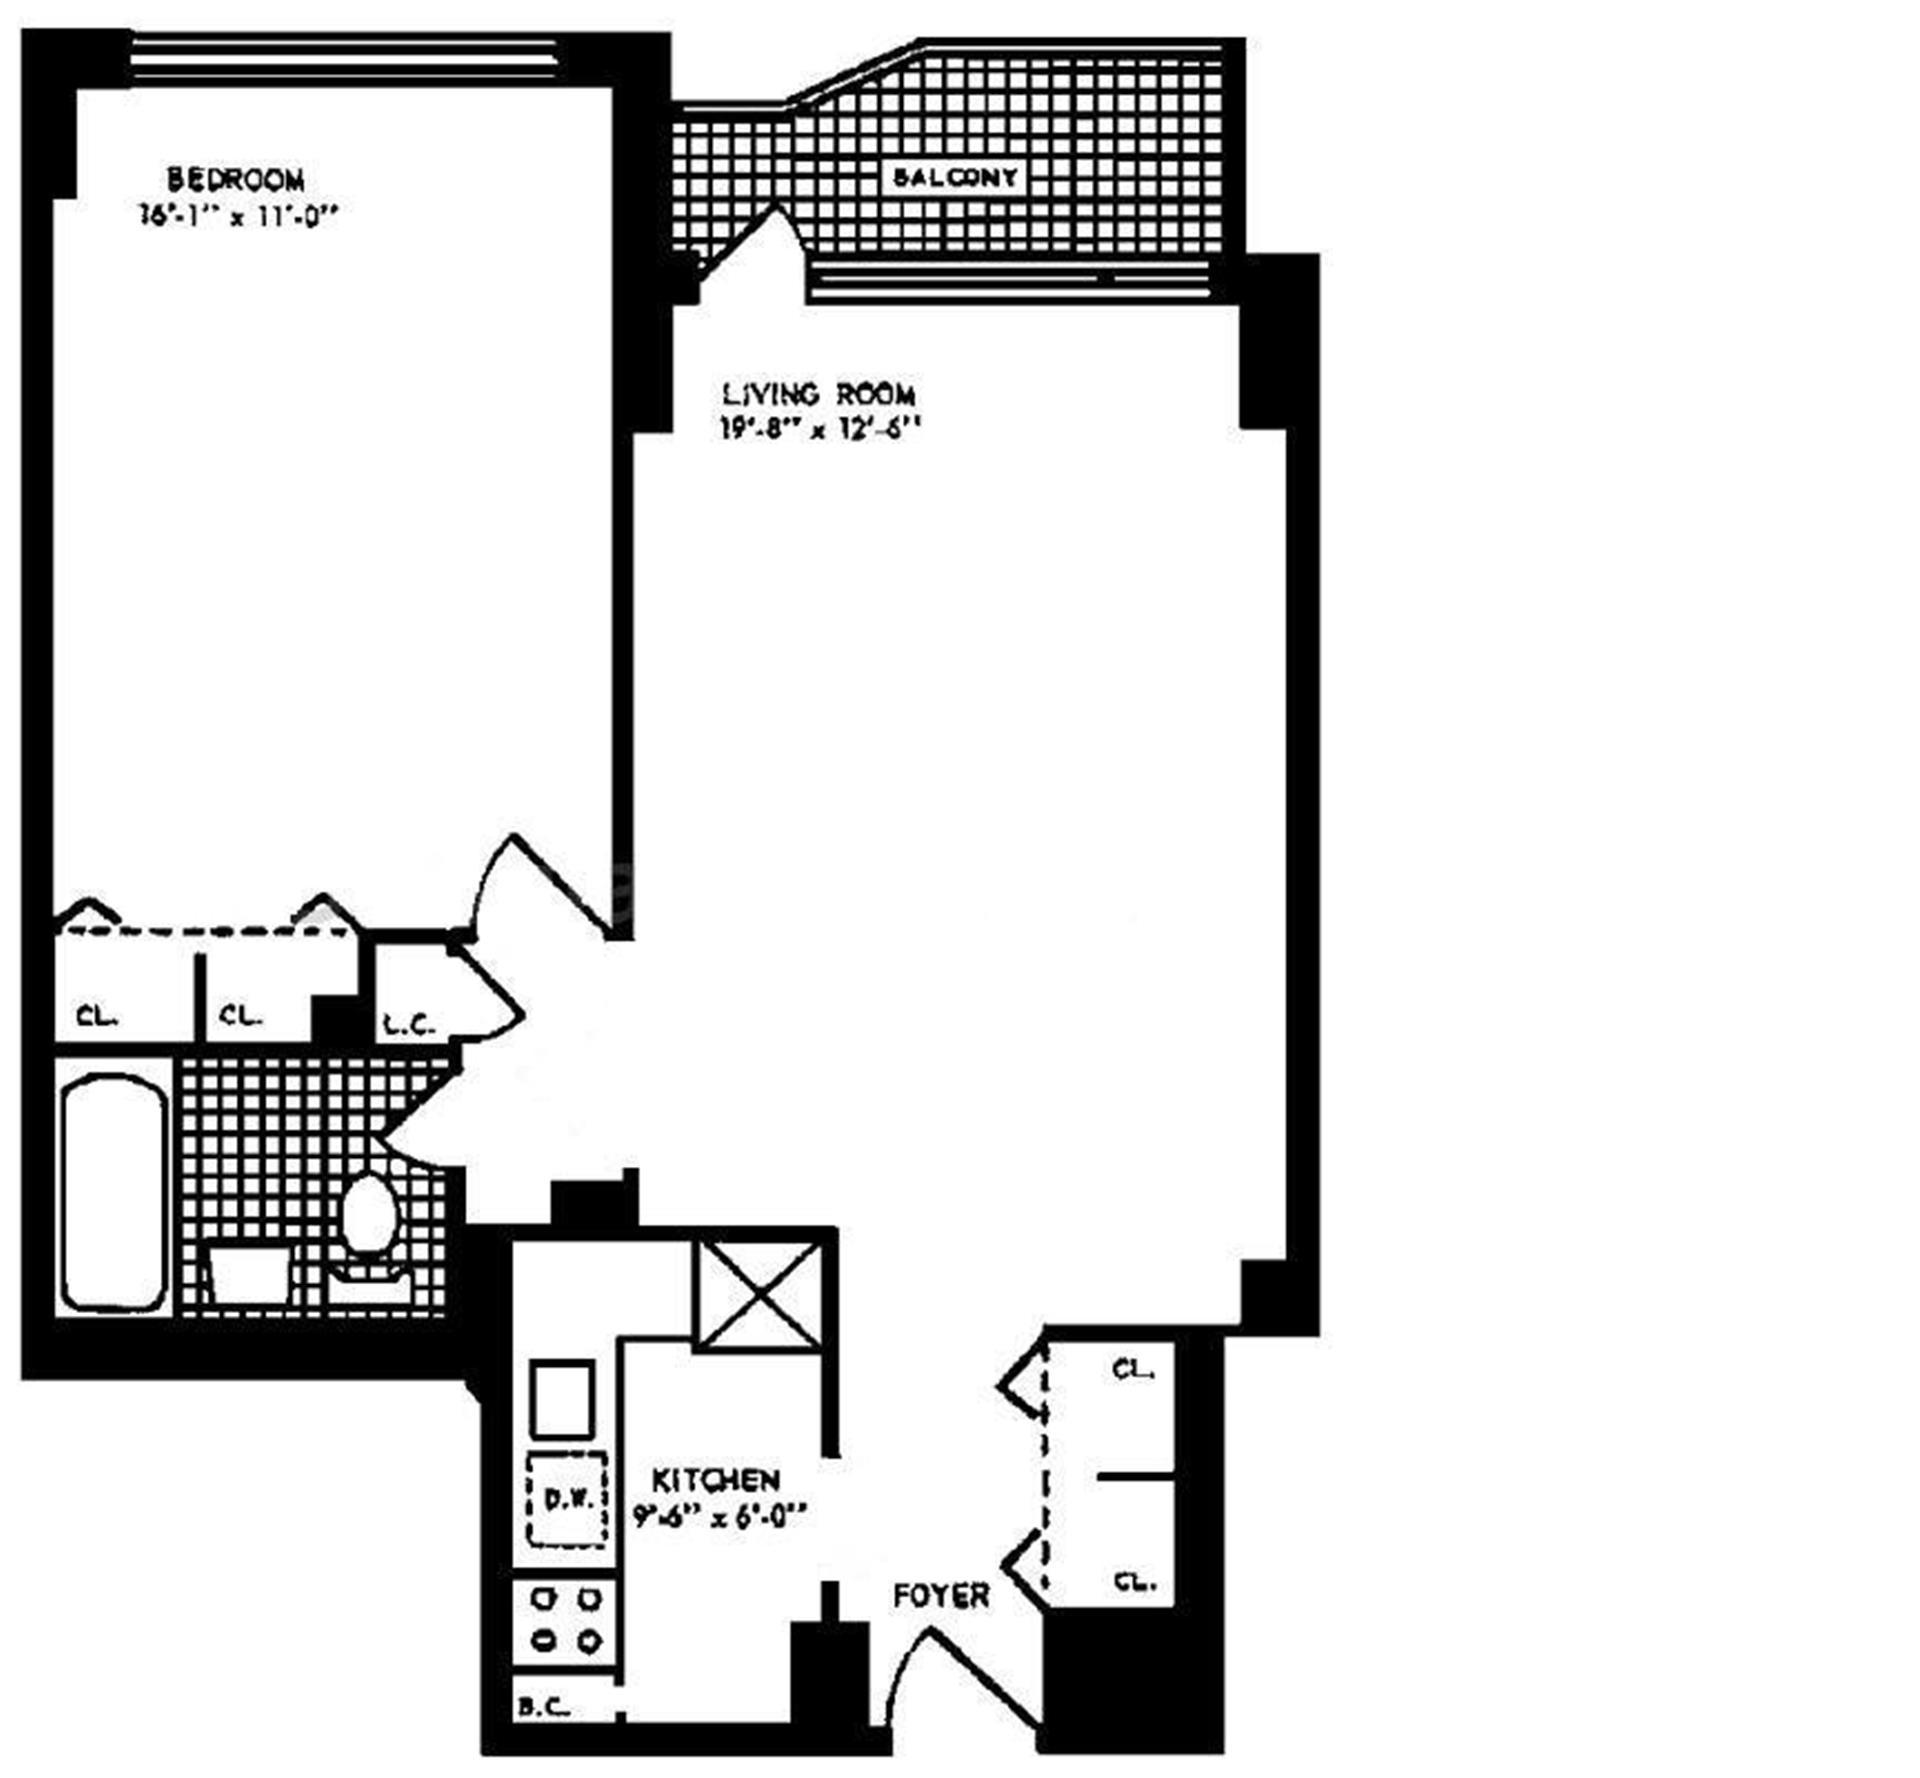 Floor plan of 1160 Third Avenue, 7A - Upper East Side, New York